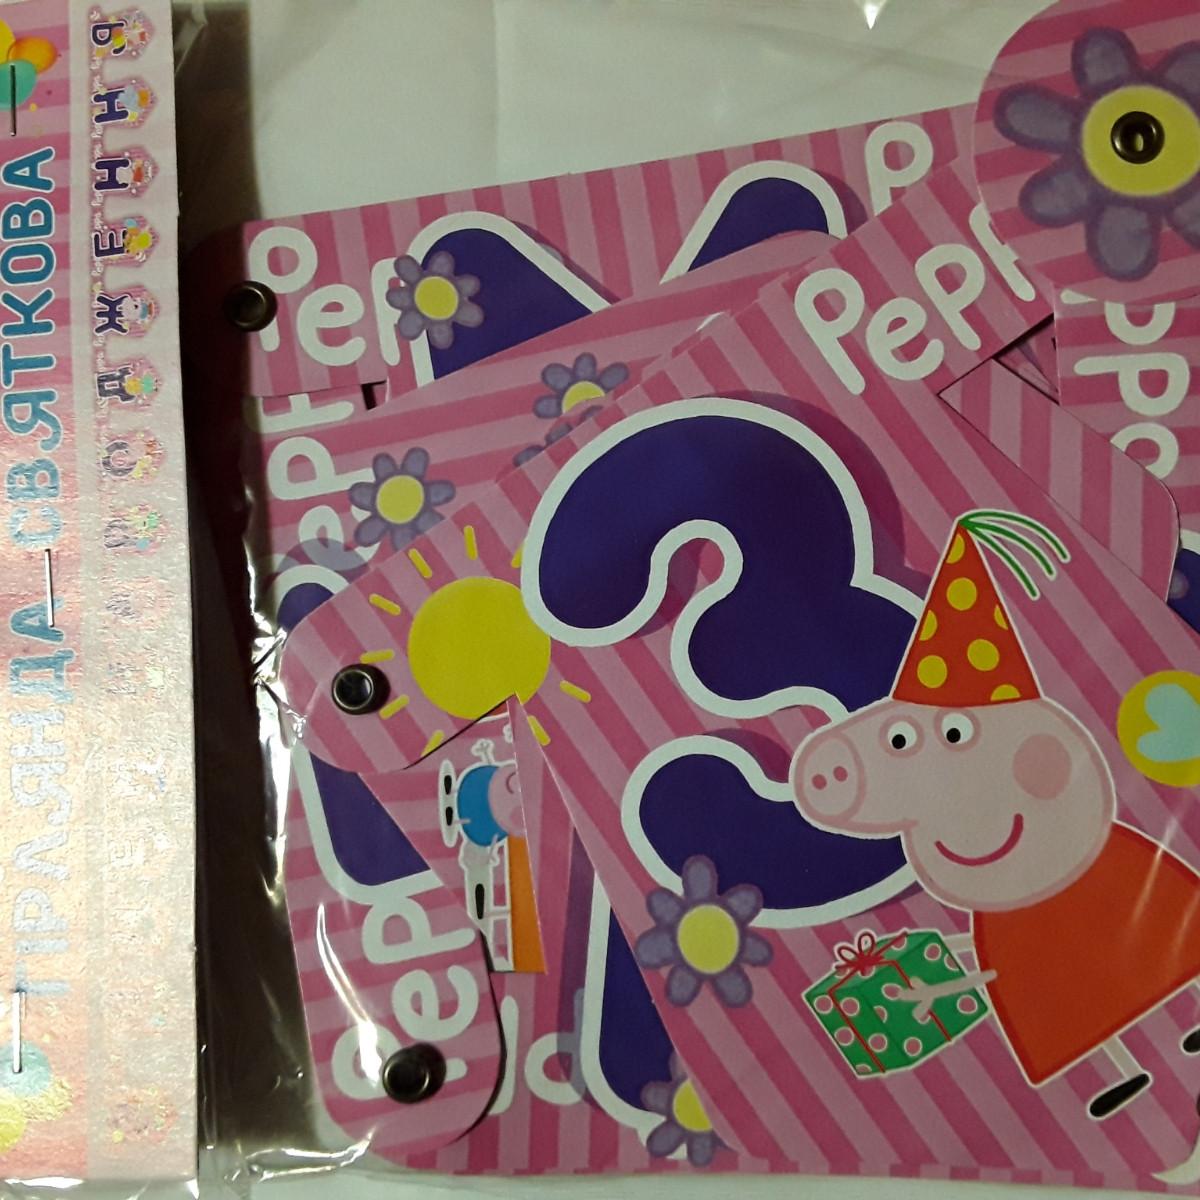 Гирлянда праздничная свинка пеппа з днем народження